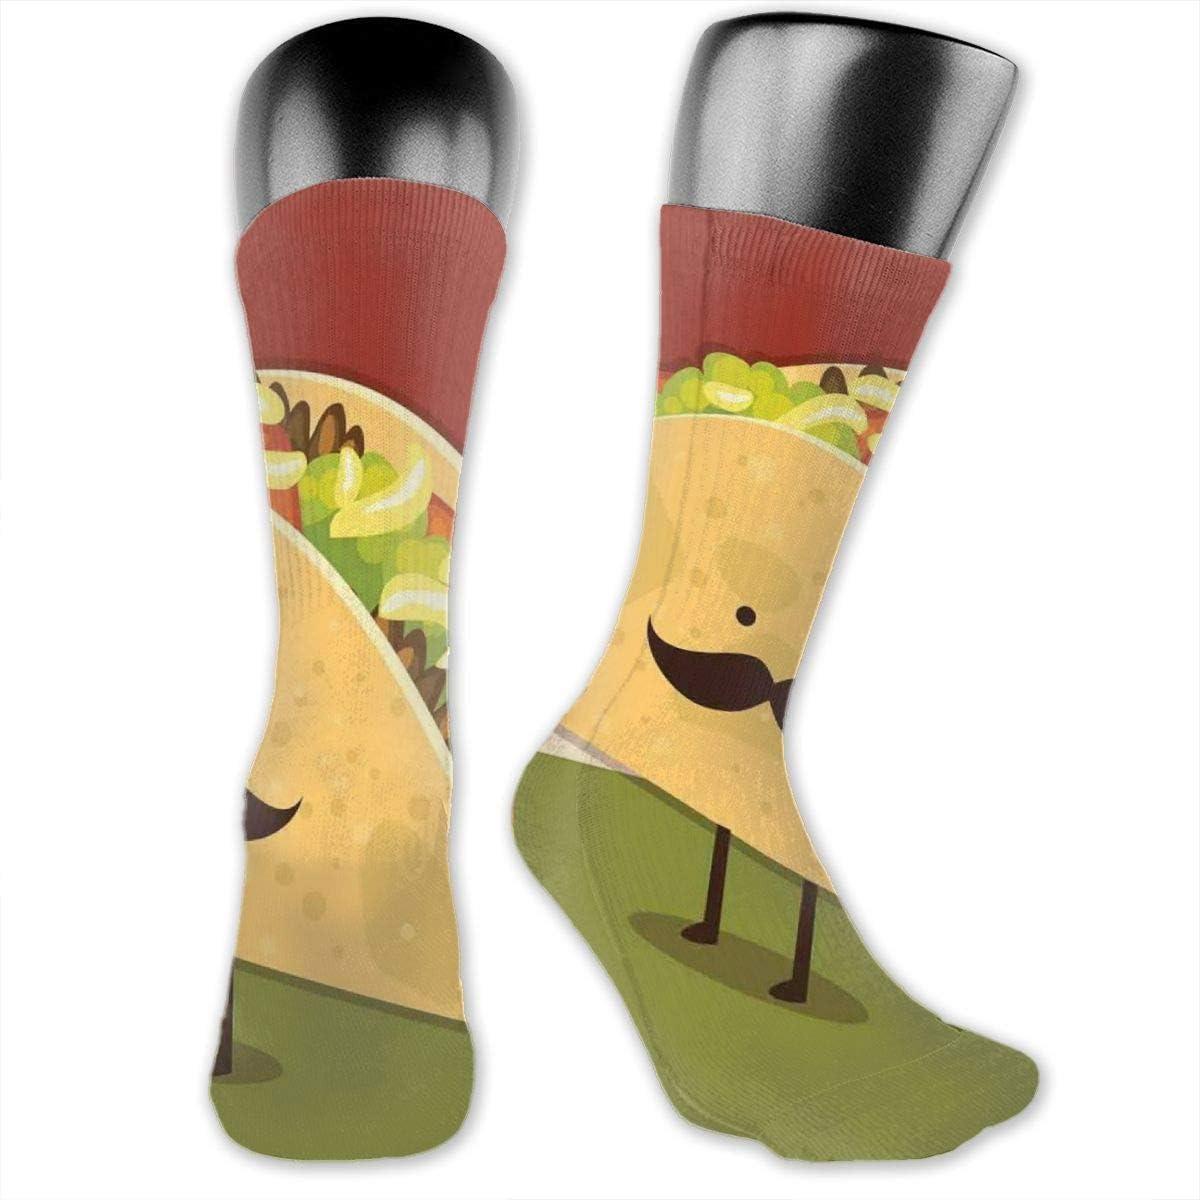 Mexican Texas Cactus Plants Spikes Cartoon Like Artistic Print Socks Compression Medium Calf Crew Sock